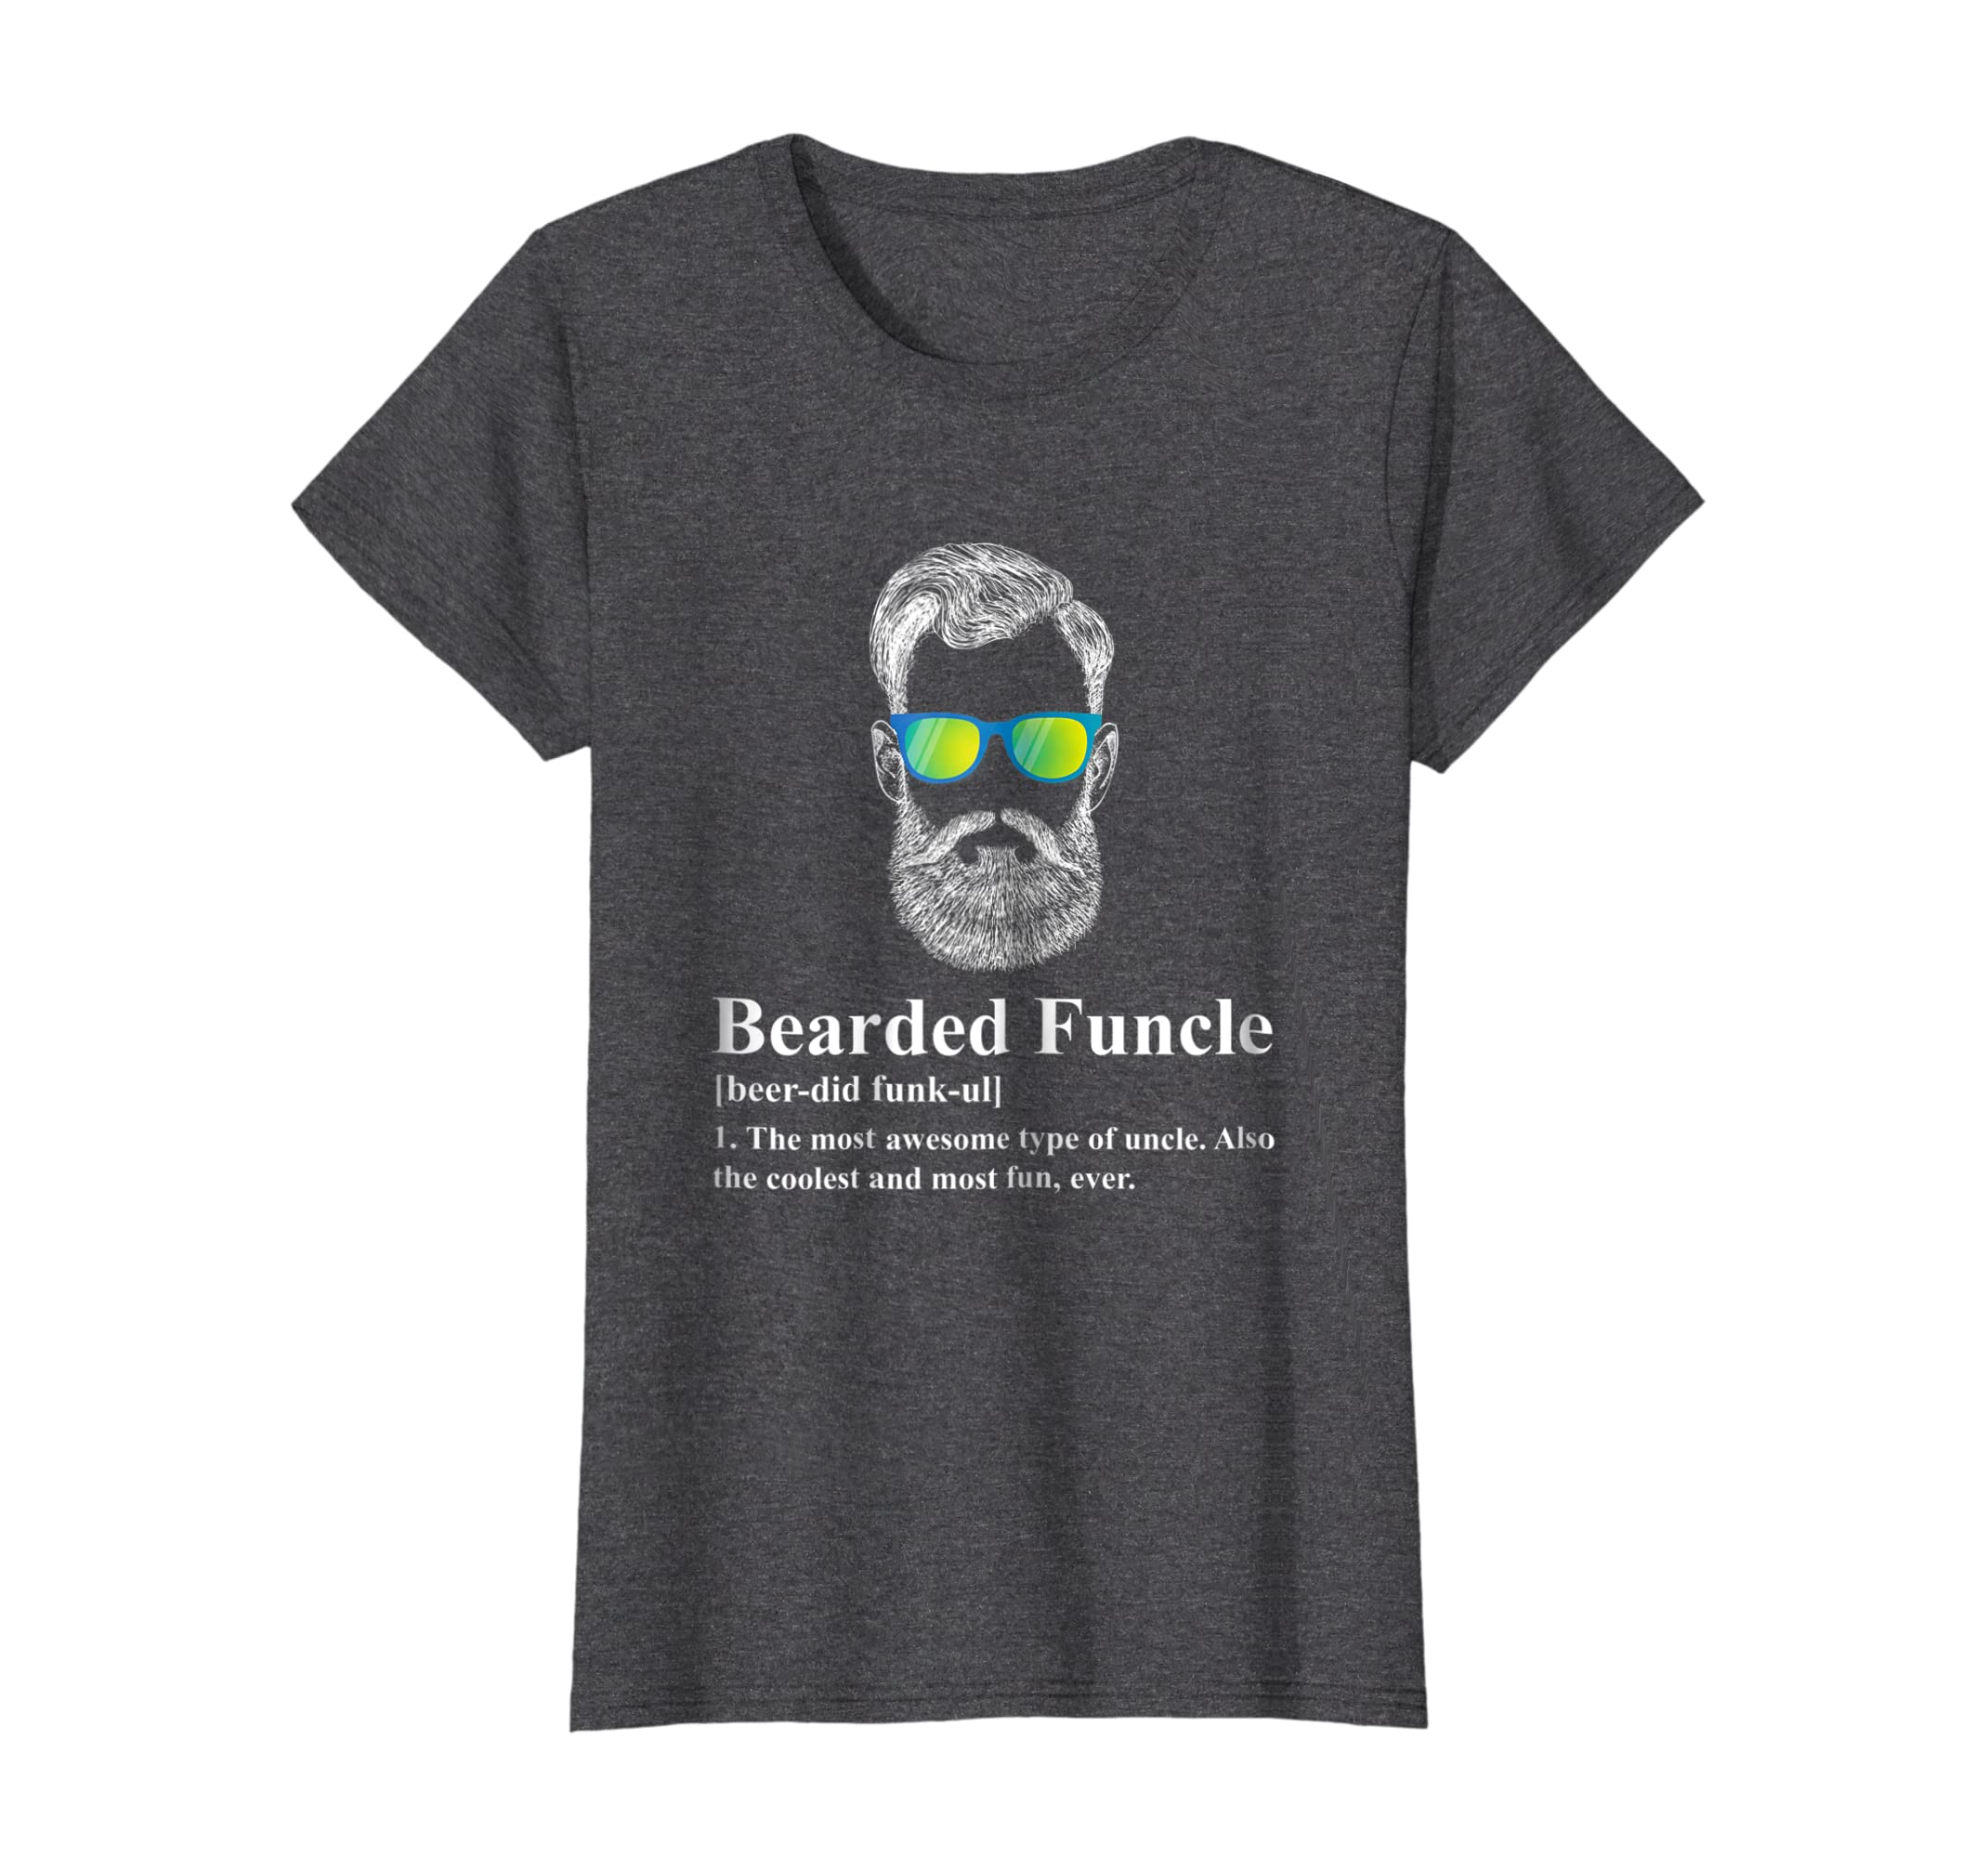 Funny Bearded Funcle Shirt for Men-Teesml